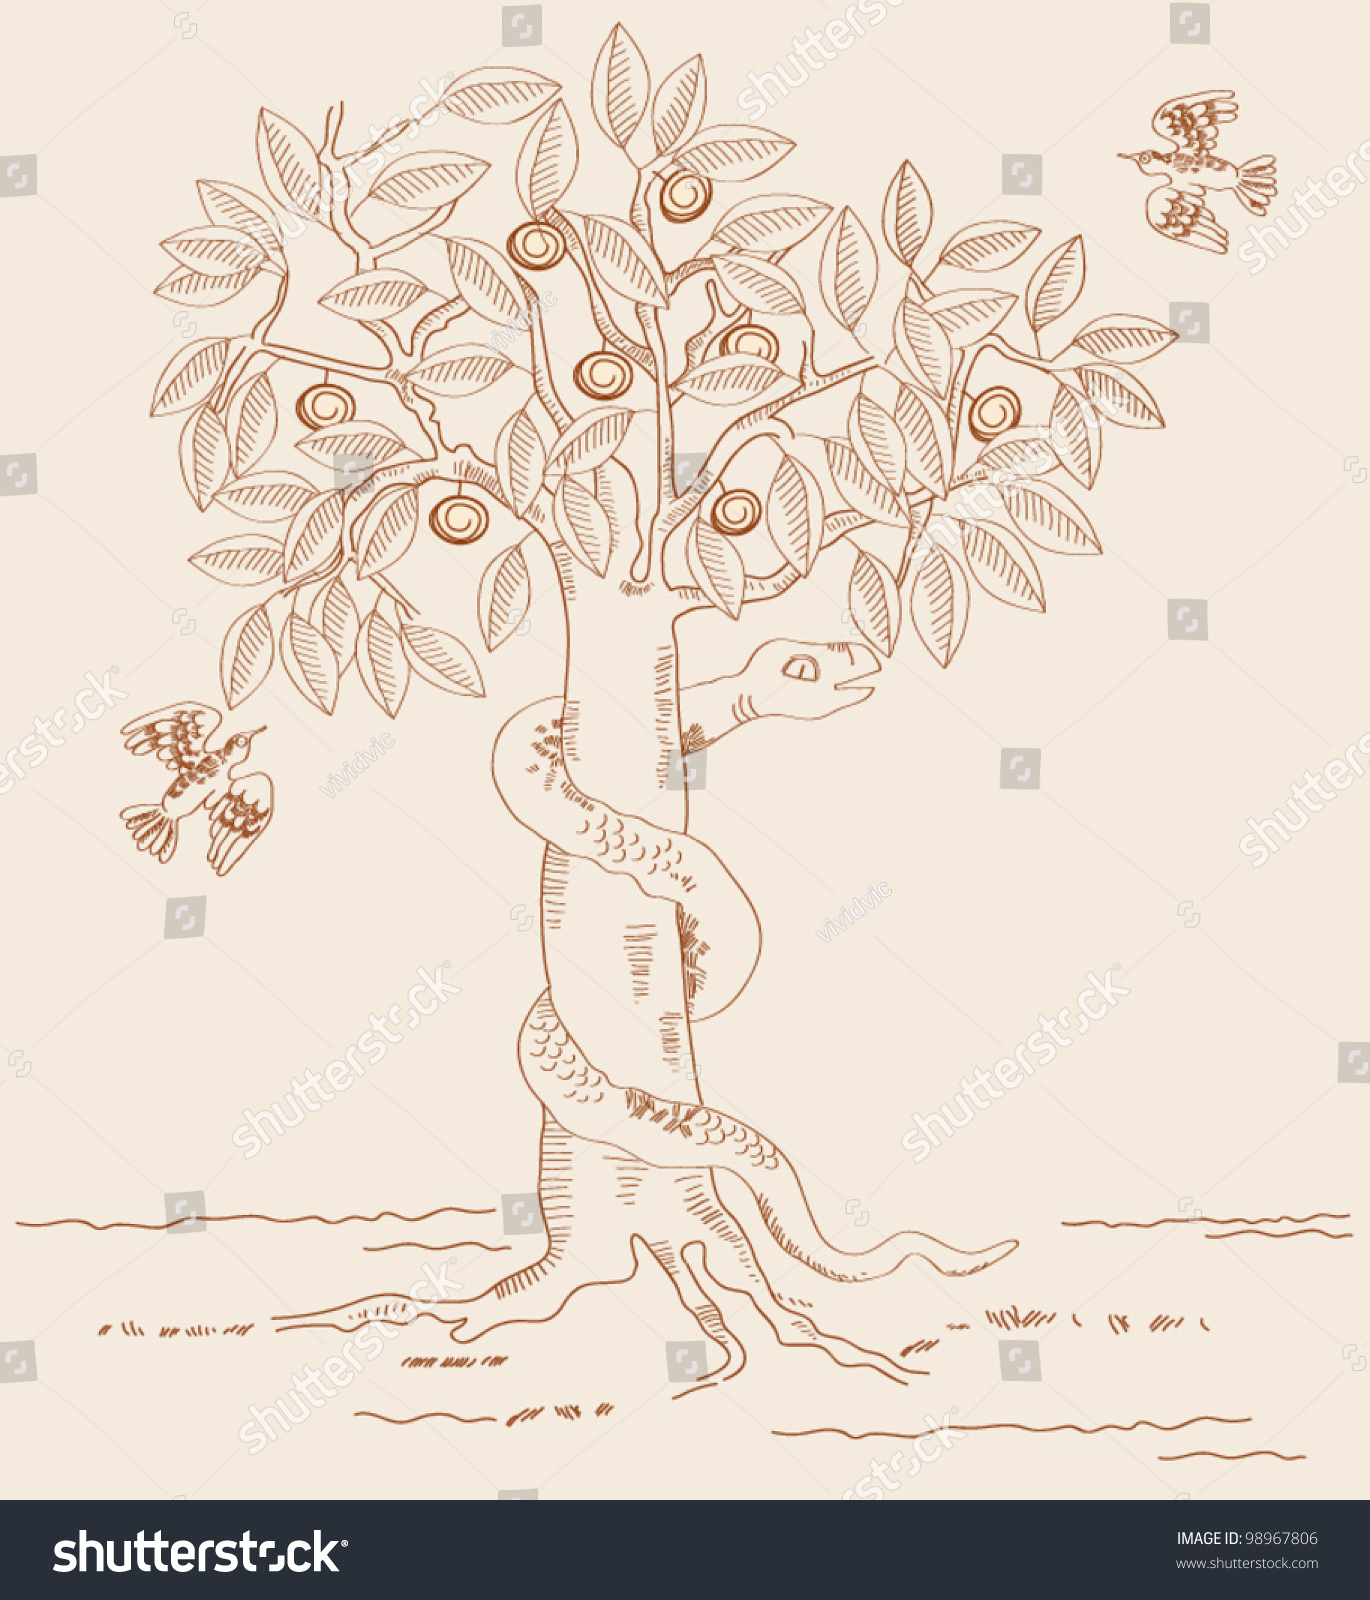 The serpent in garden of eden the tree of knowledge for Garden of eden xml design pattern